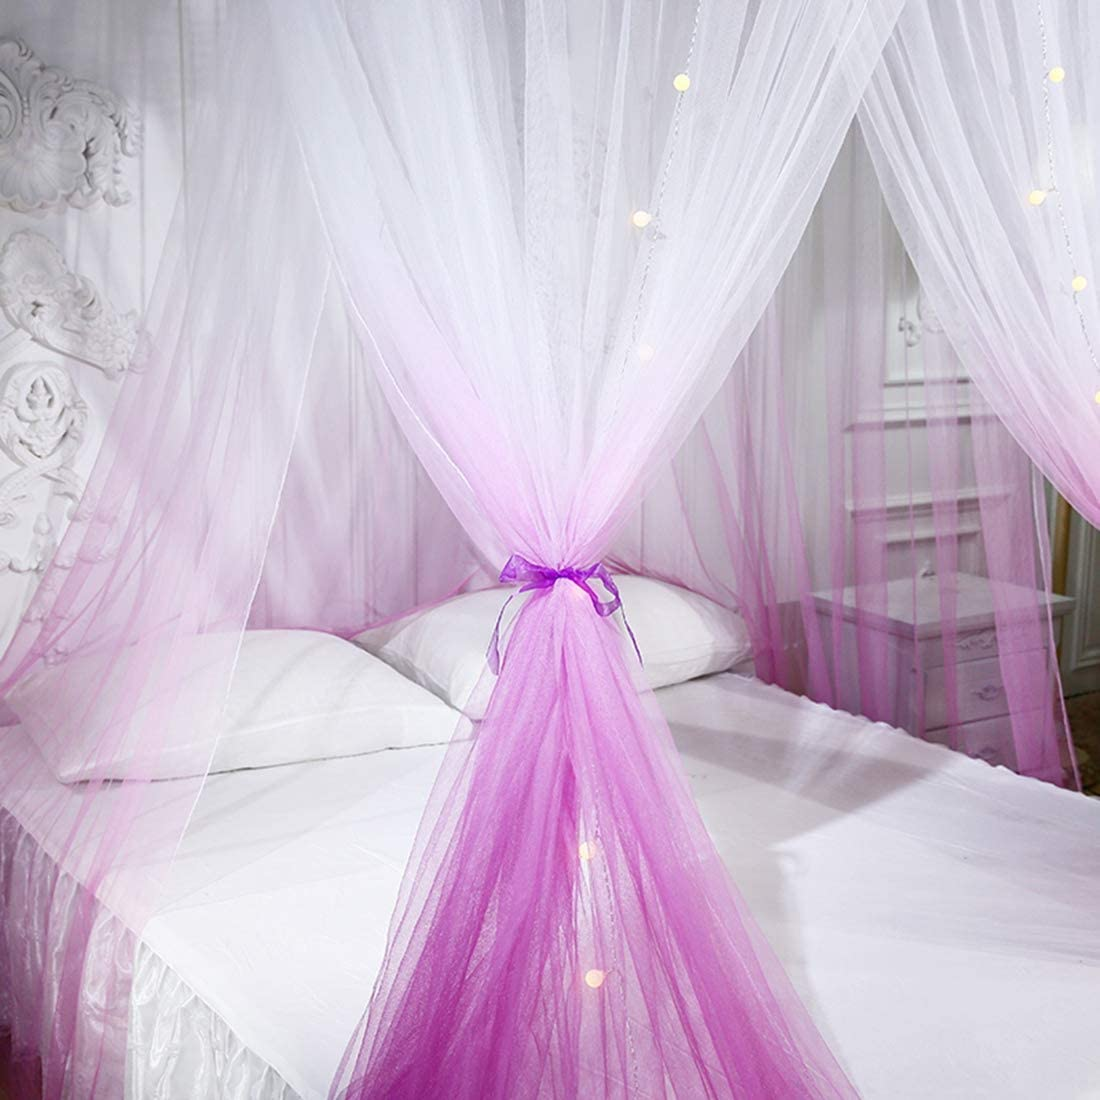 Bverionant Mosquitero con Dosel Repelente de Insectos Mosquitera de C/úpula Mosquitero Decorativo para Cama Individual Matrimonial Doble Azul